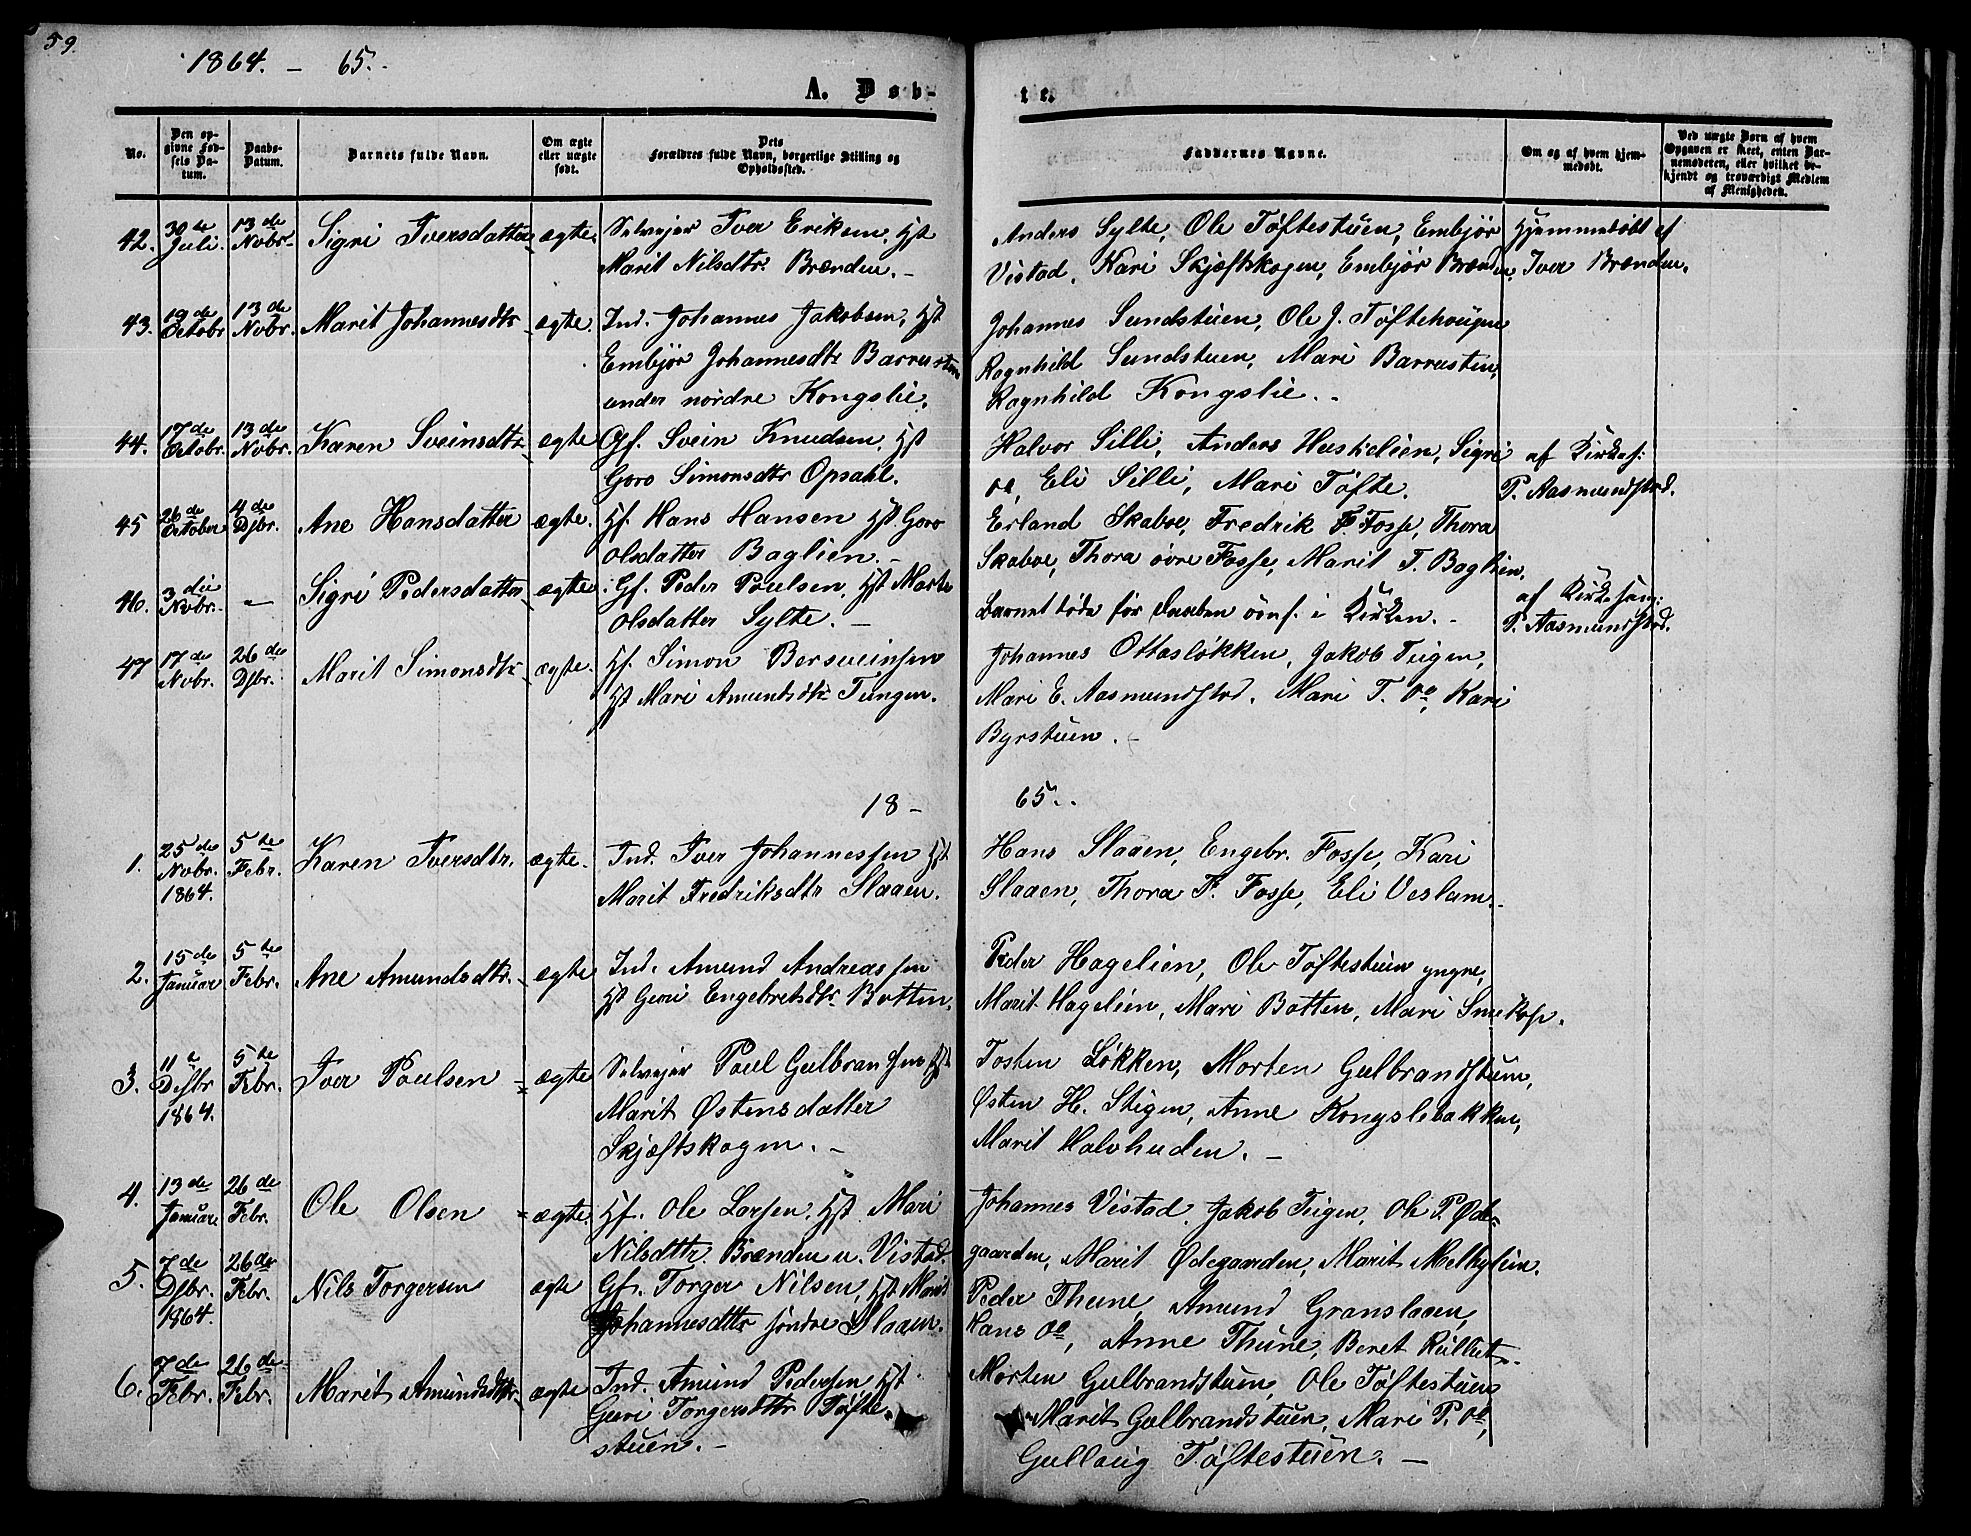 SAH, Nord-Fron prestekontor, Klokkerbok nr. 2, 1851-1883, s. 59